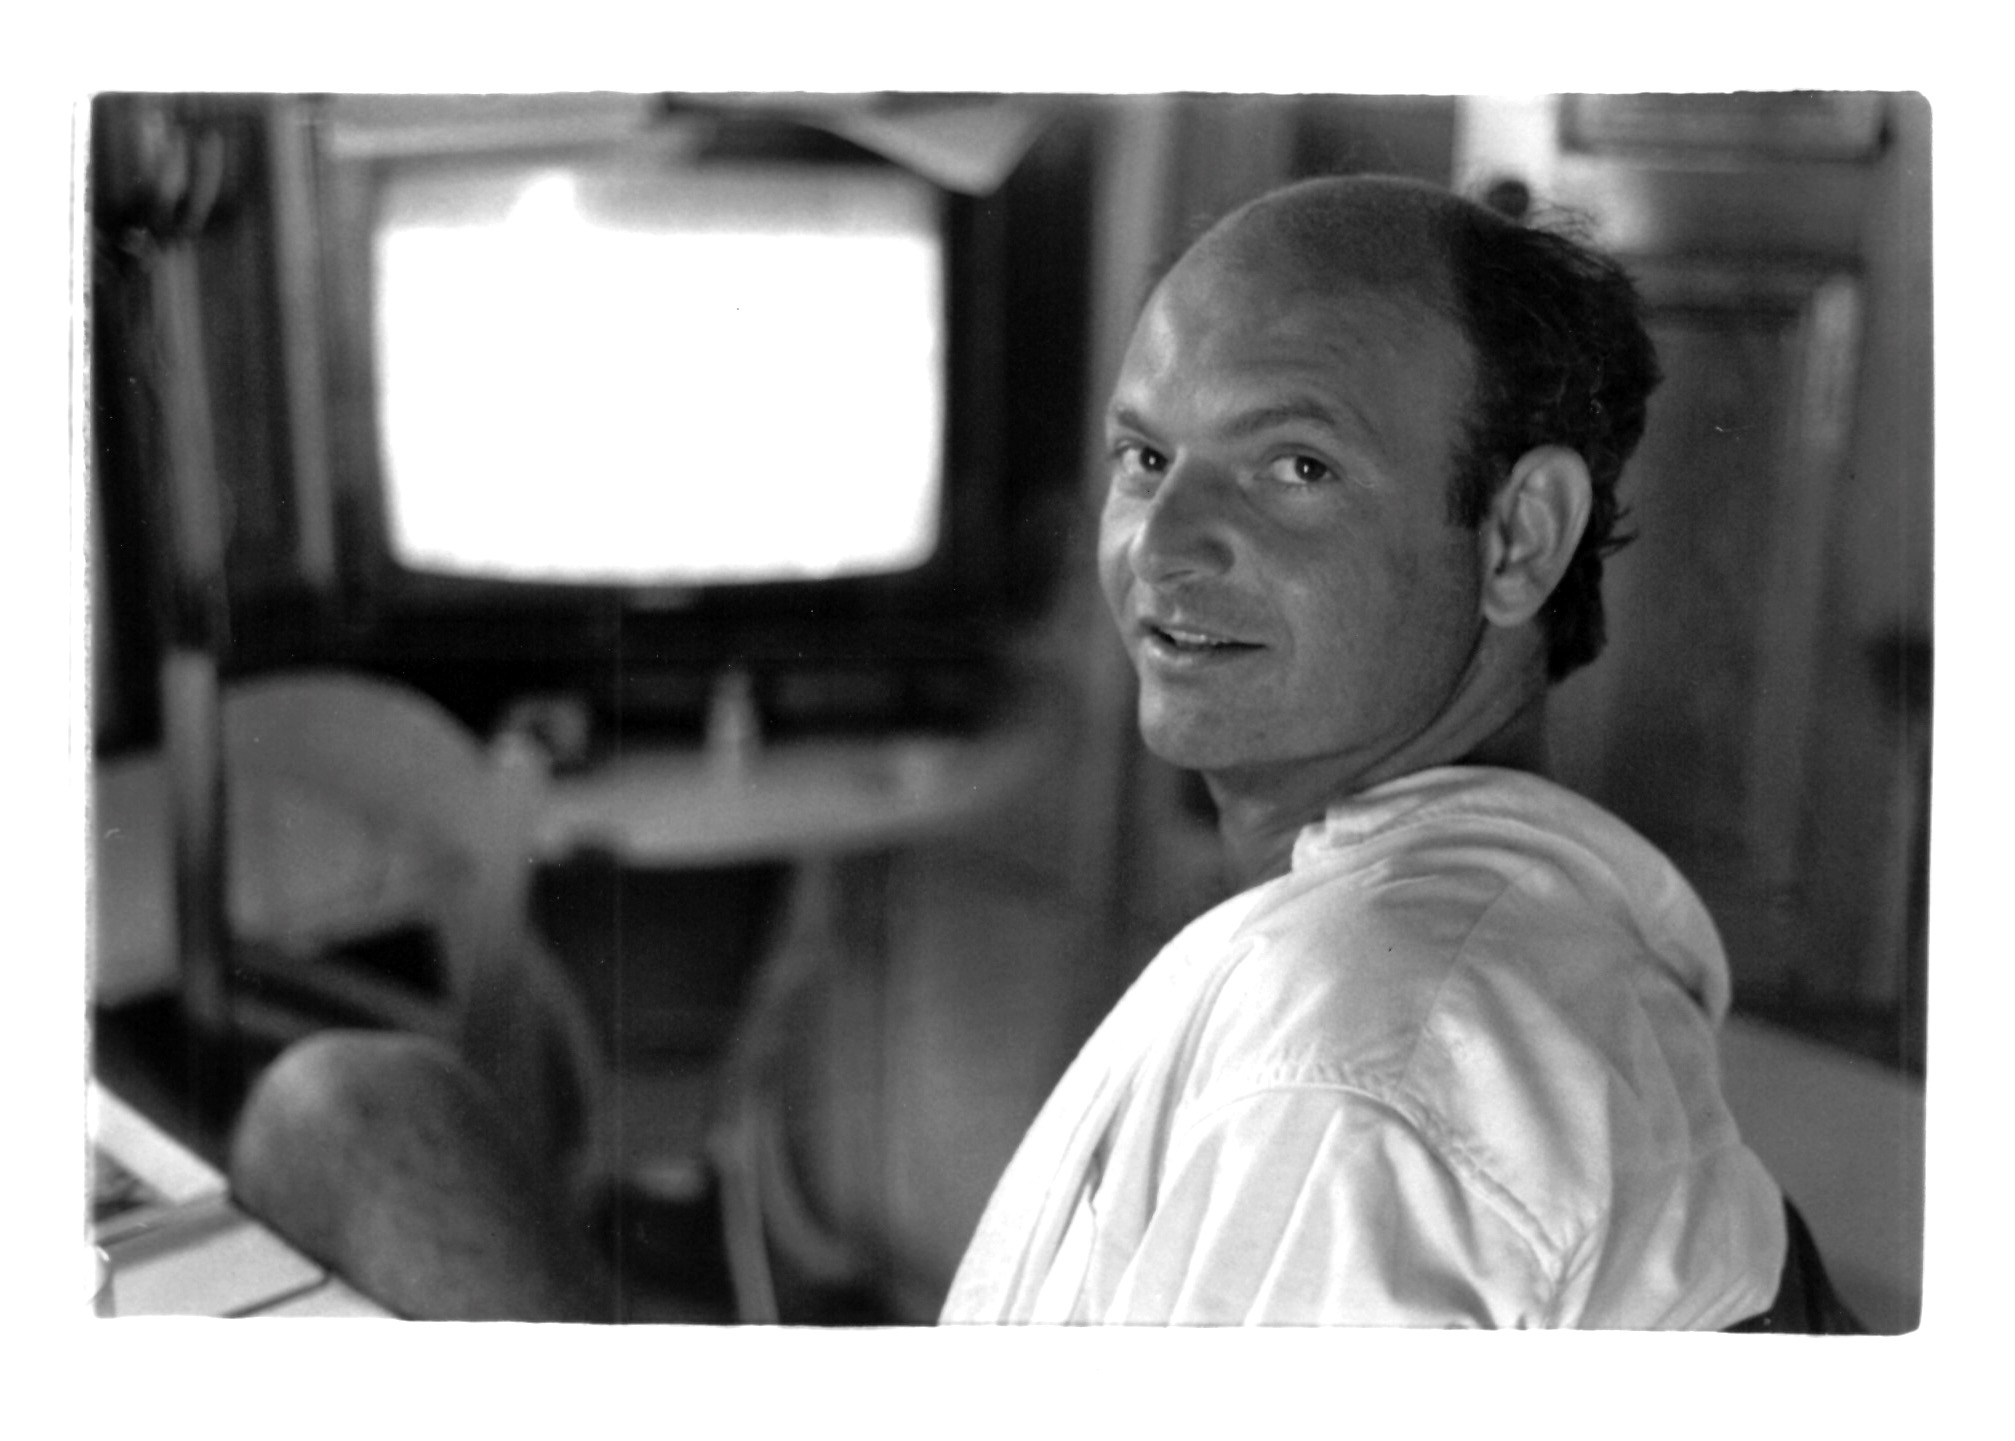 Andreas Kanellos 1990